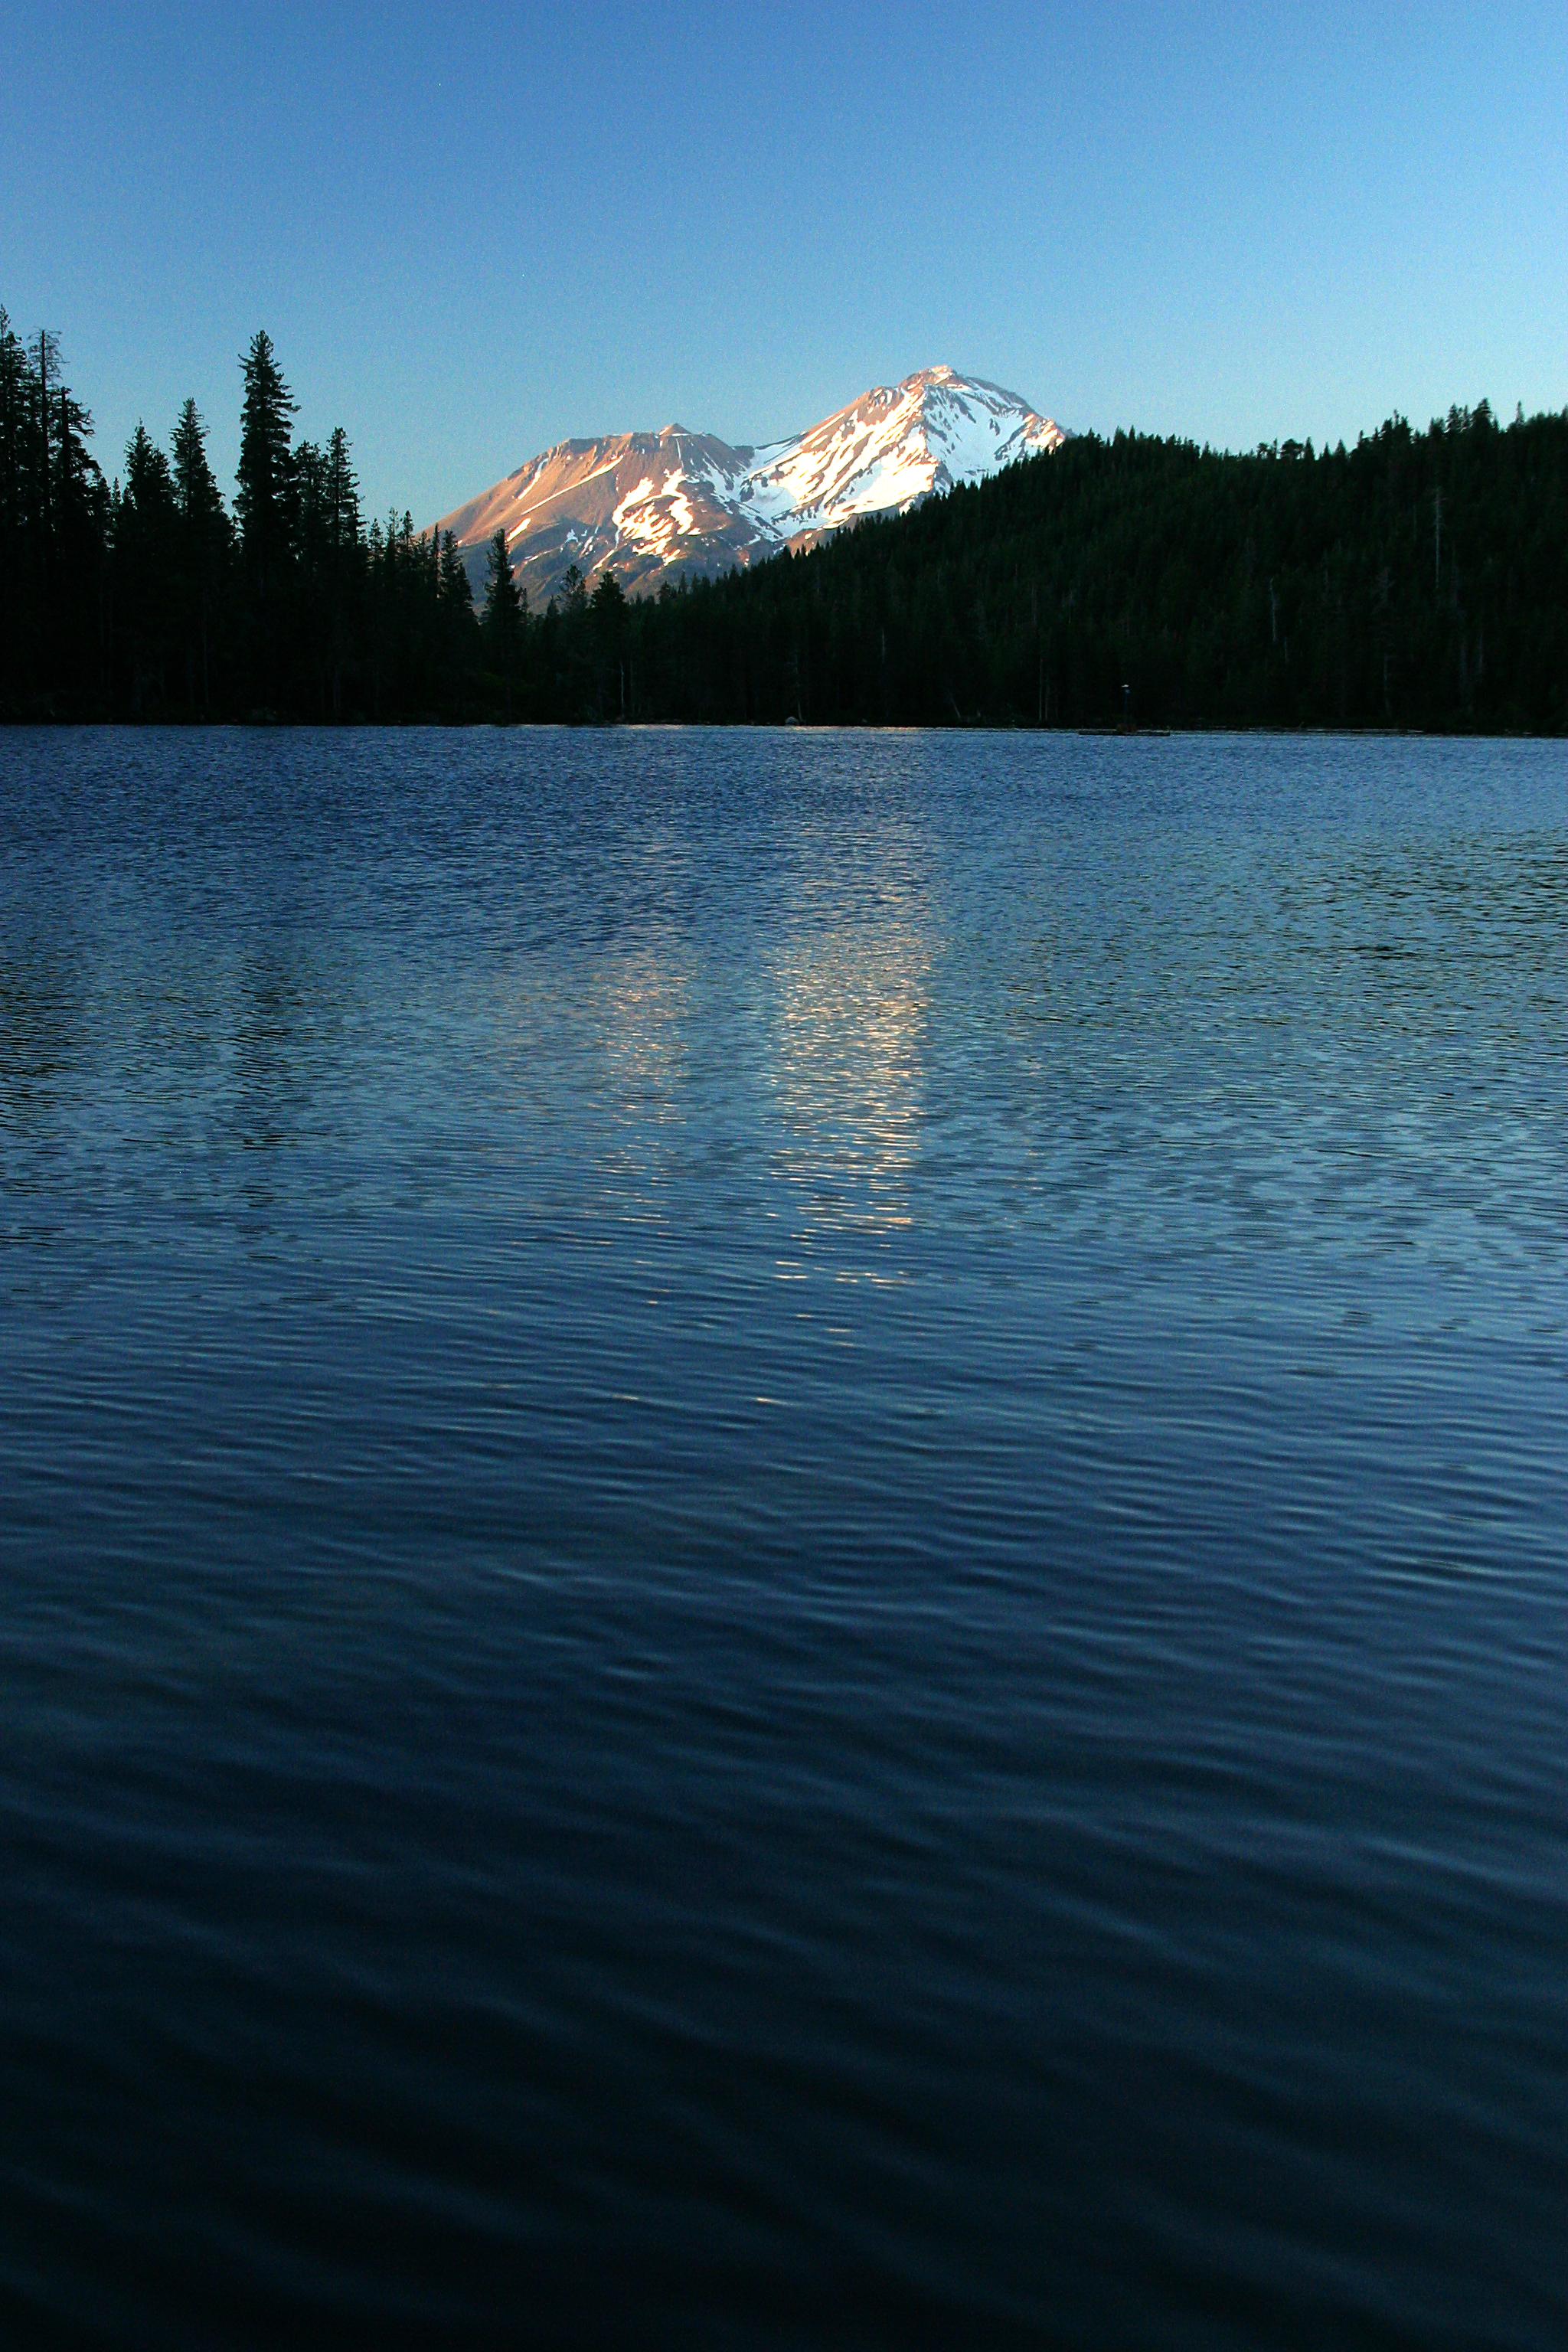 Mt Shasta Ca >> File:Castle Lake (California) - waves, Mt. Shasta ...